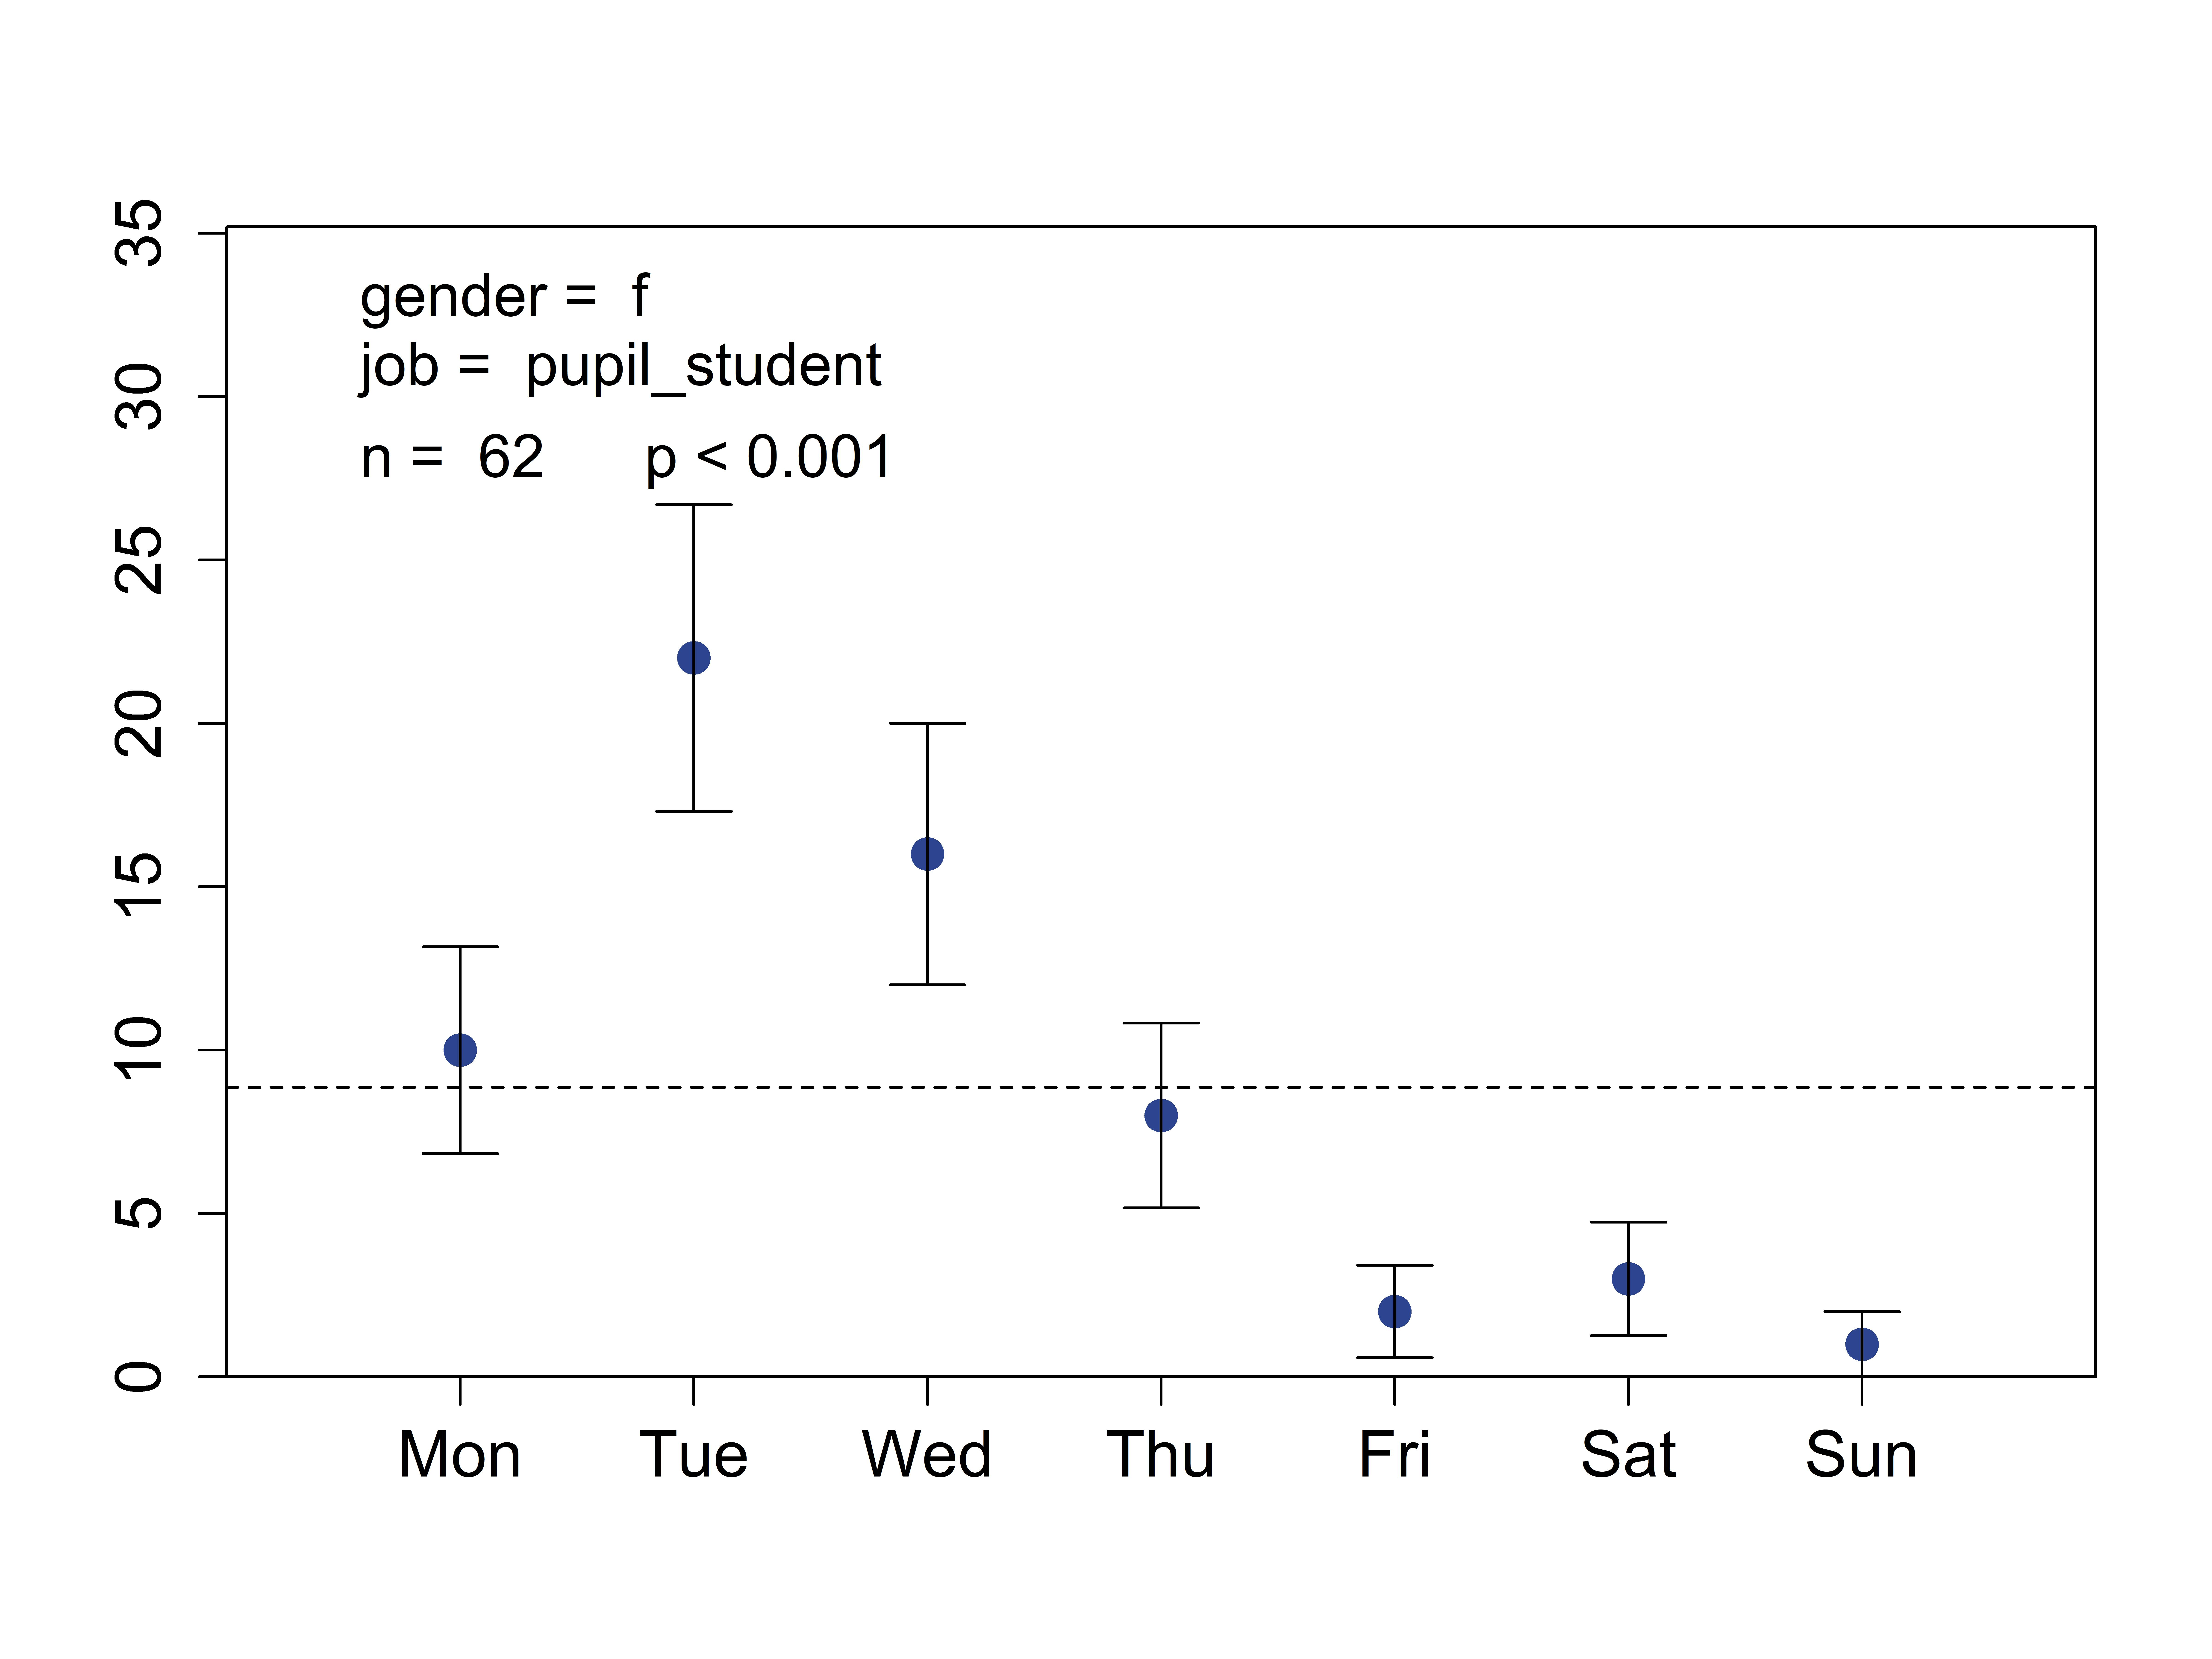 Wochentagsverteilung - Schüler/Student